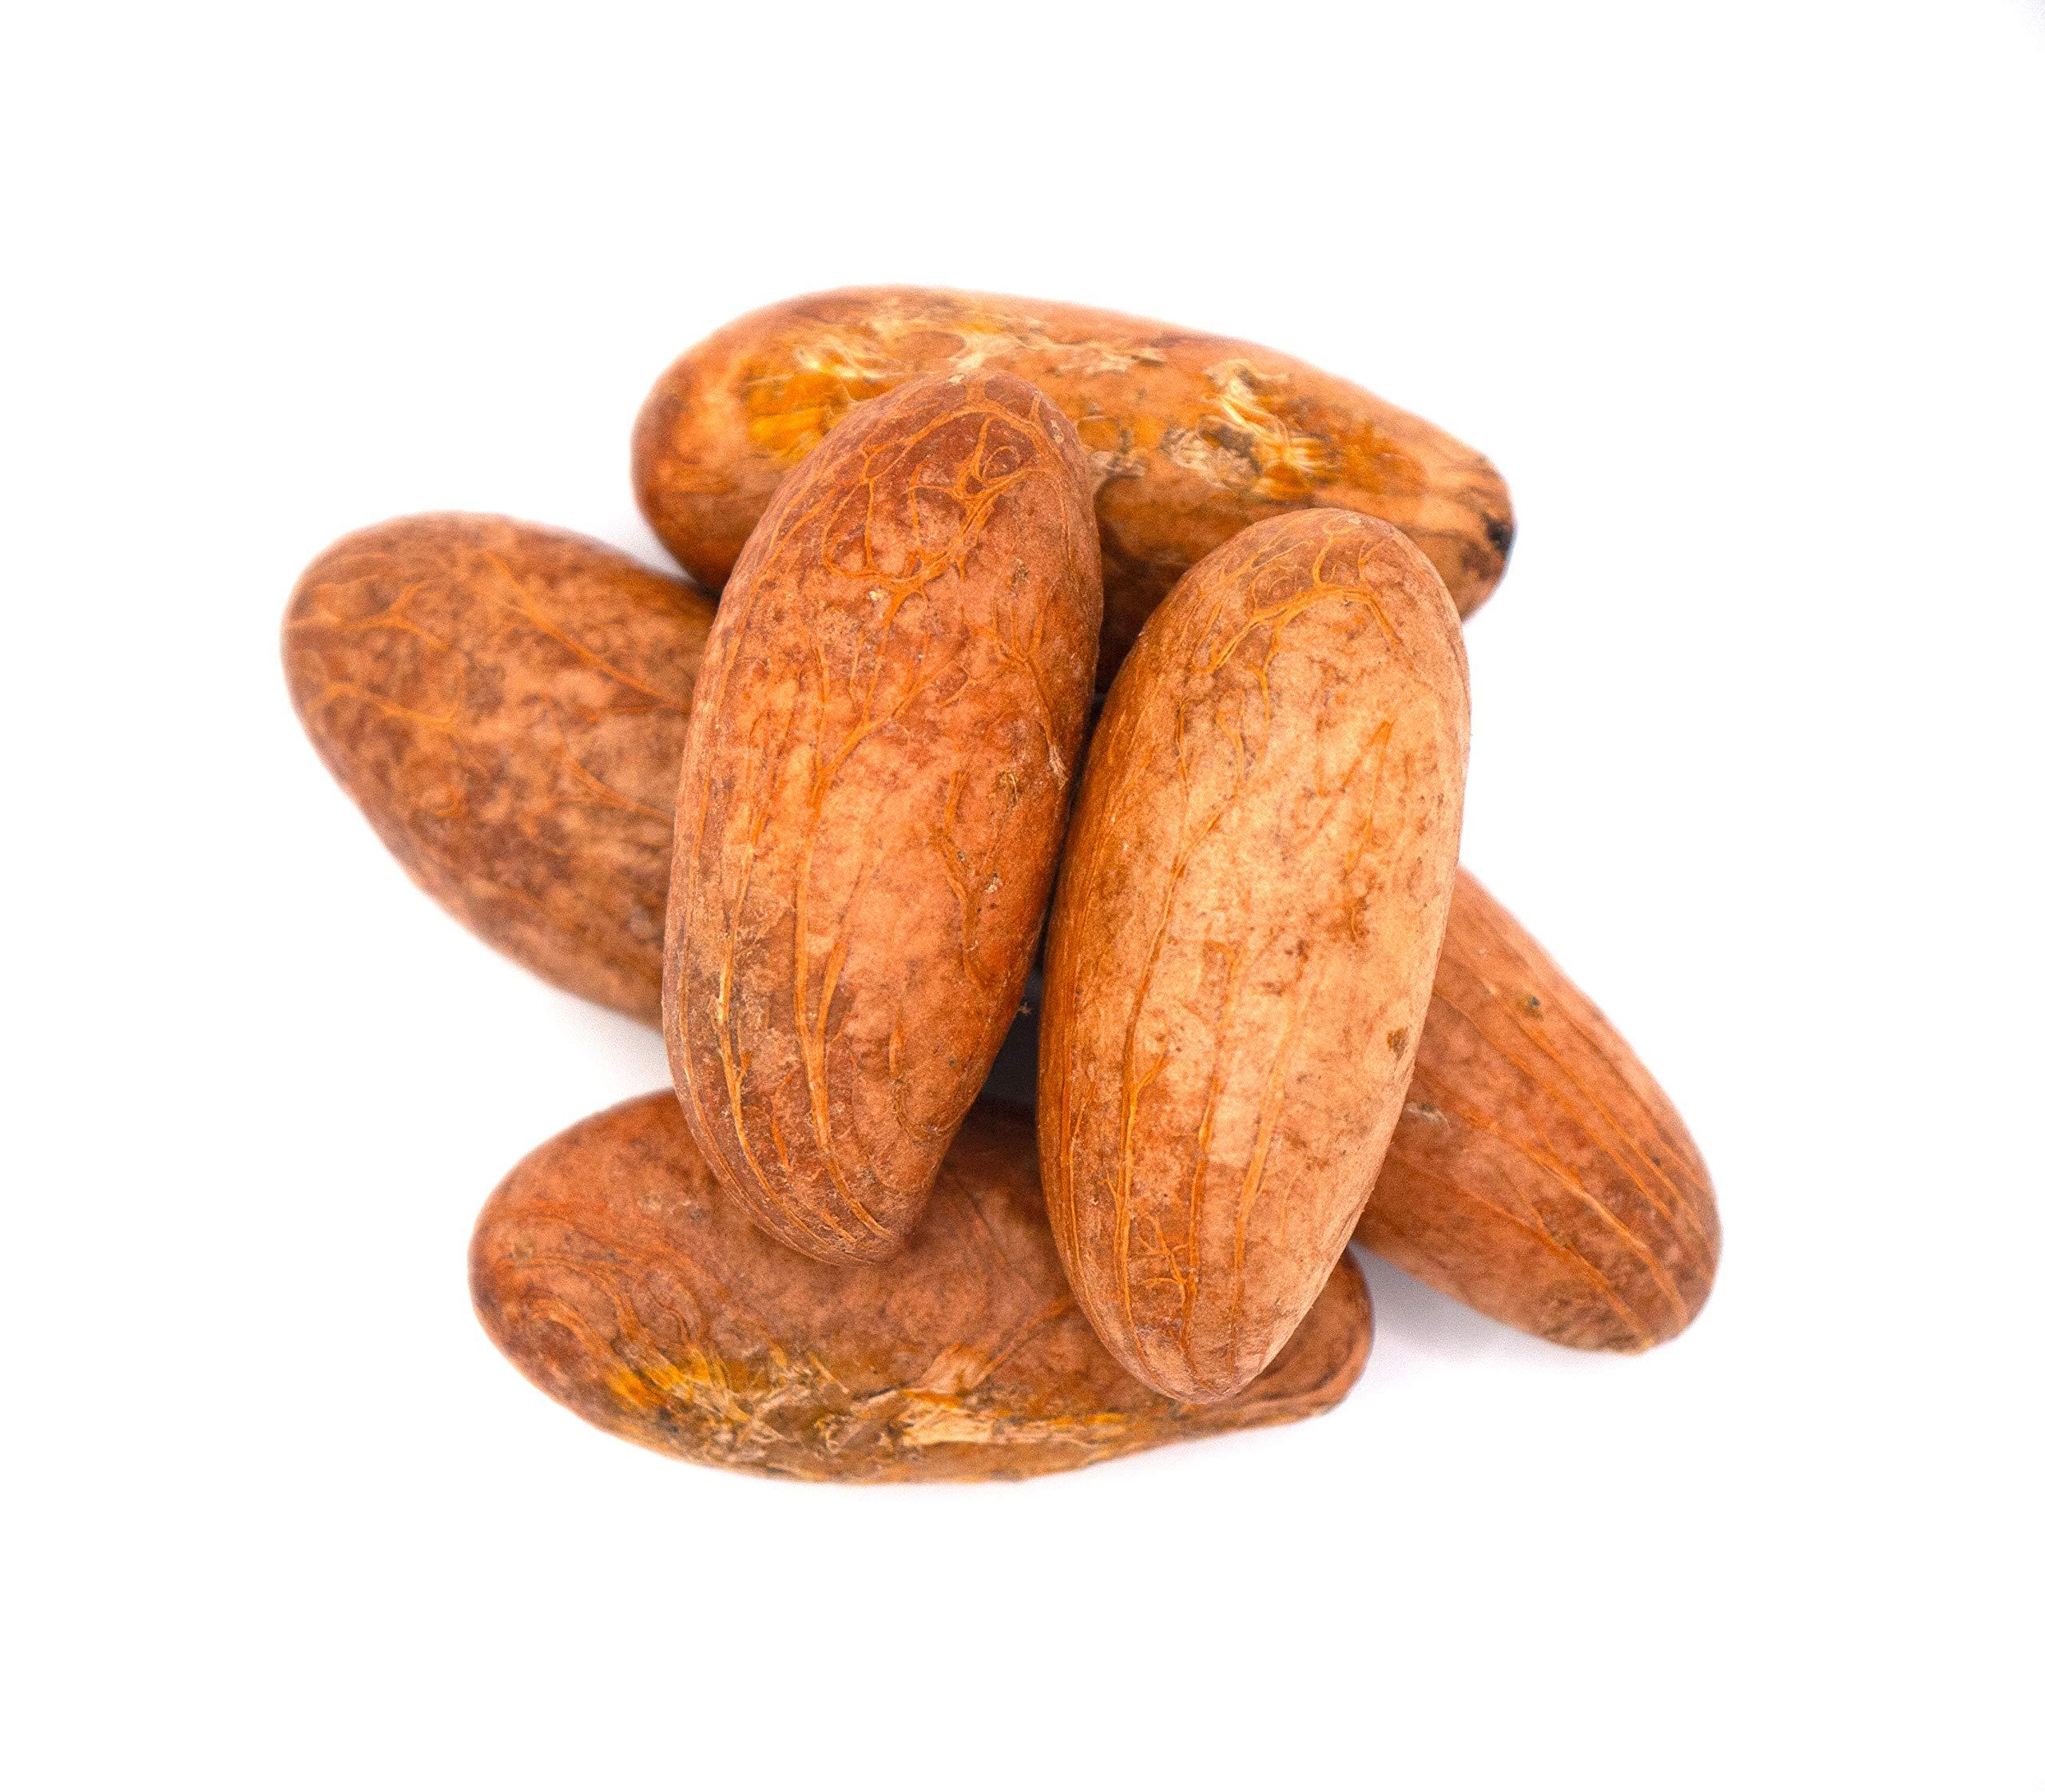 African Bitter Kola Nuts 1lb